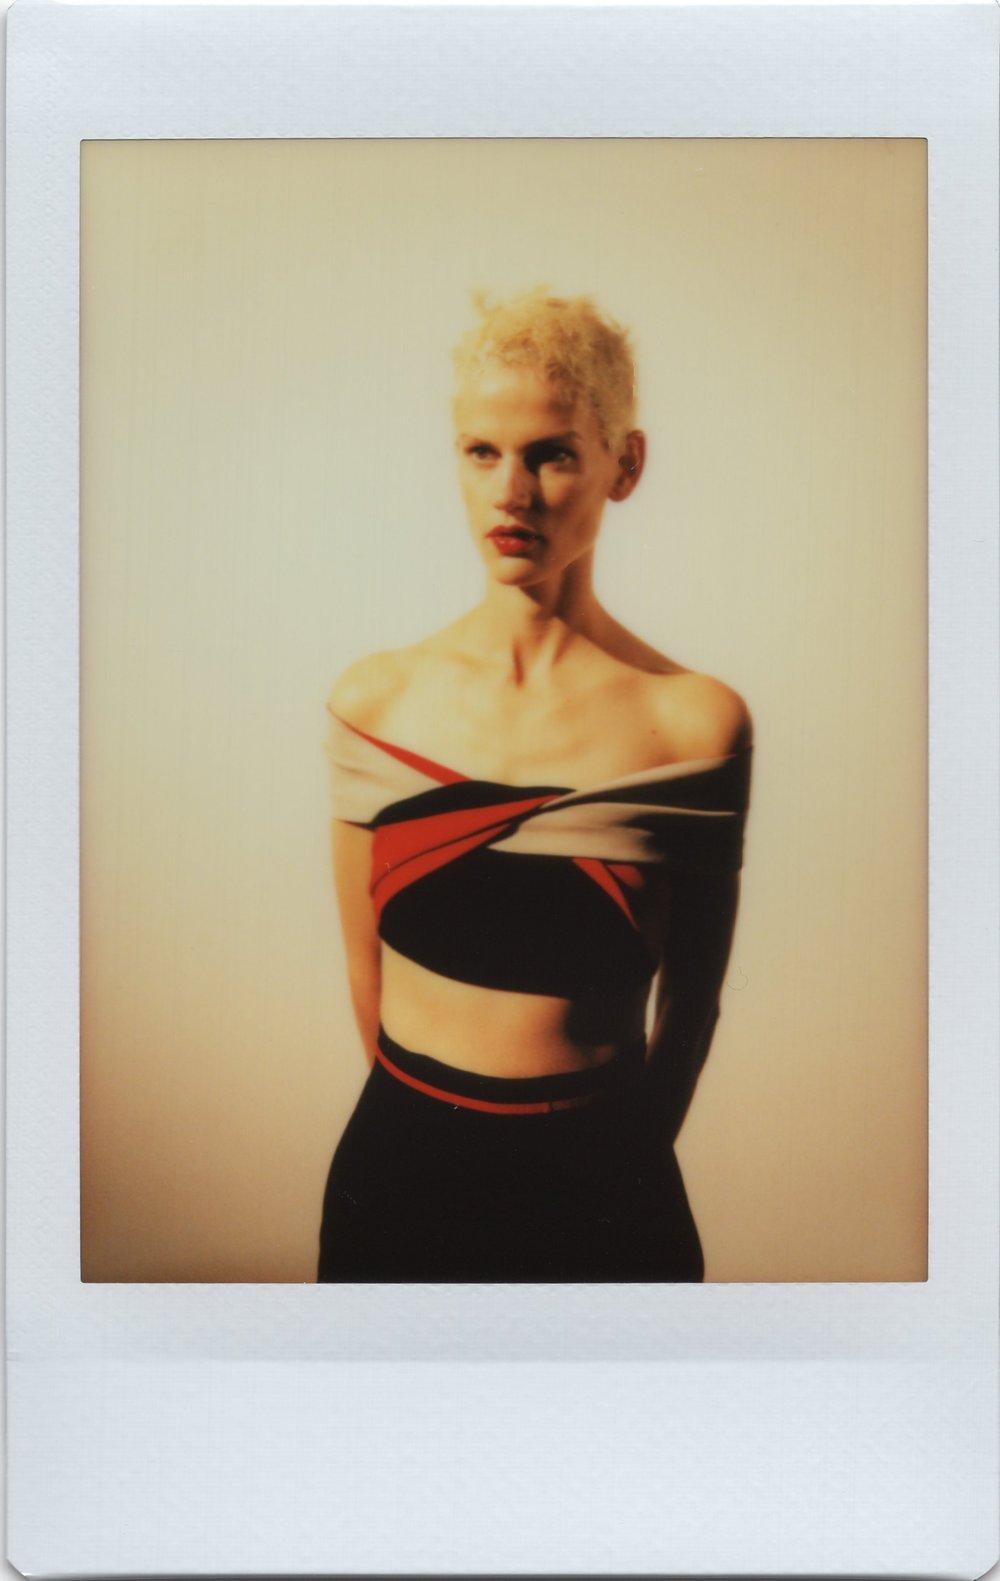 HaiderAckermann_Honigschreck_Polaroid_3.jpg